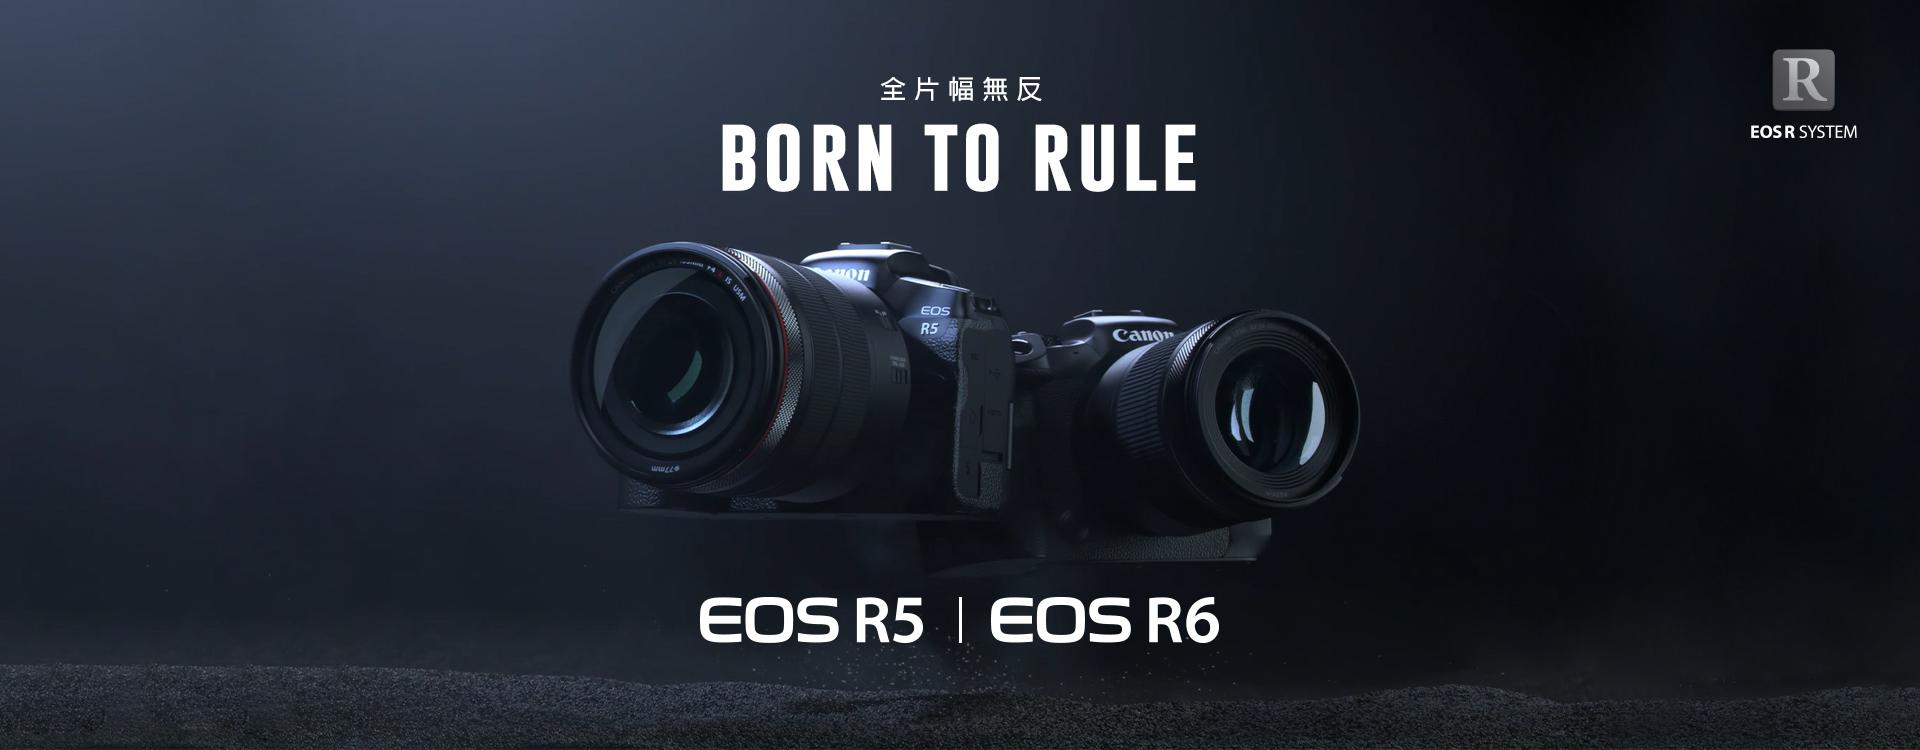 BornToRule_CorpSite_1920x750px_tc.jpg